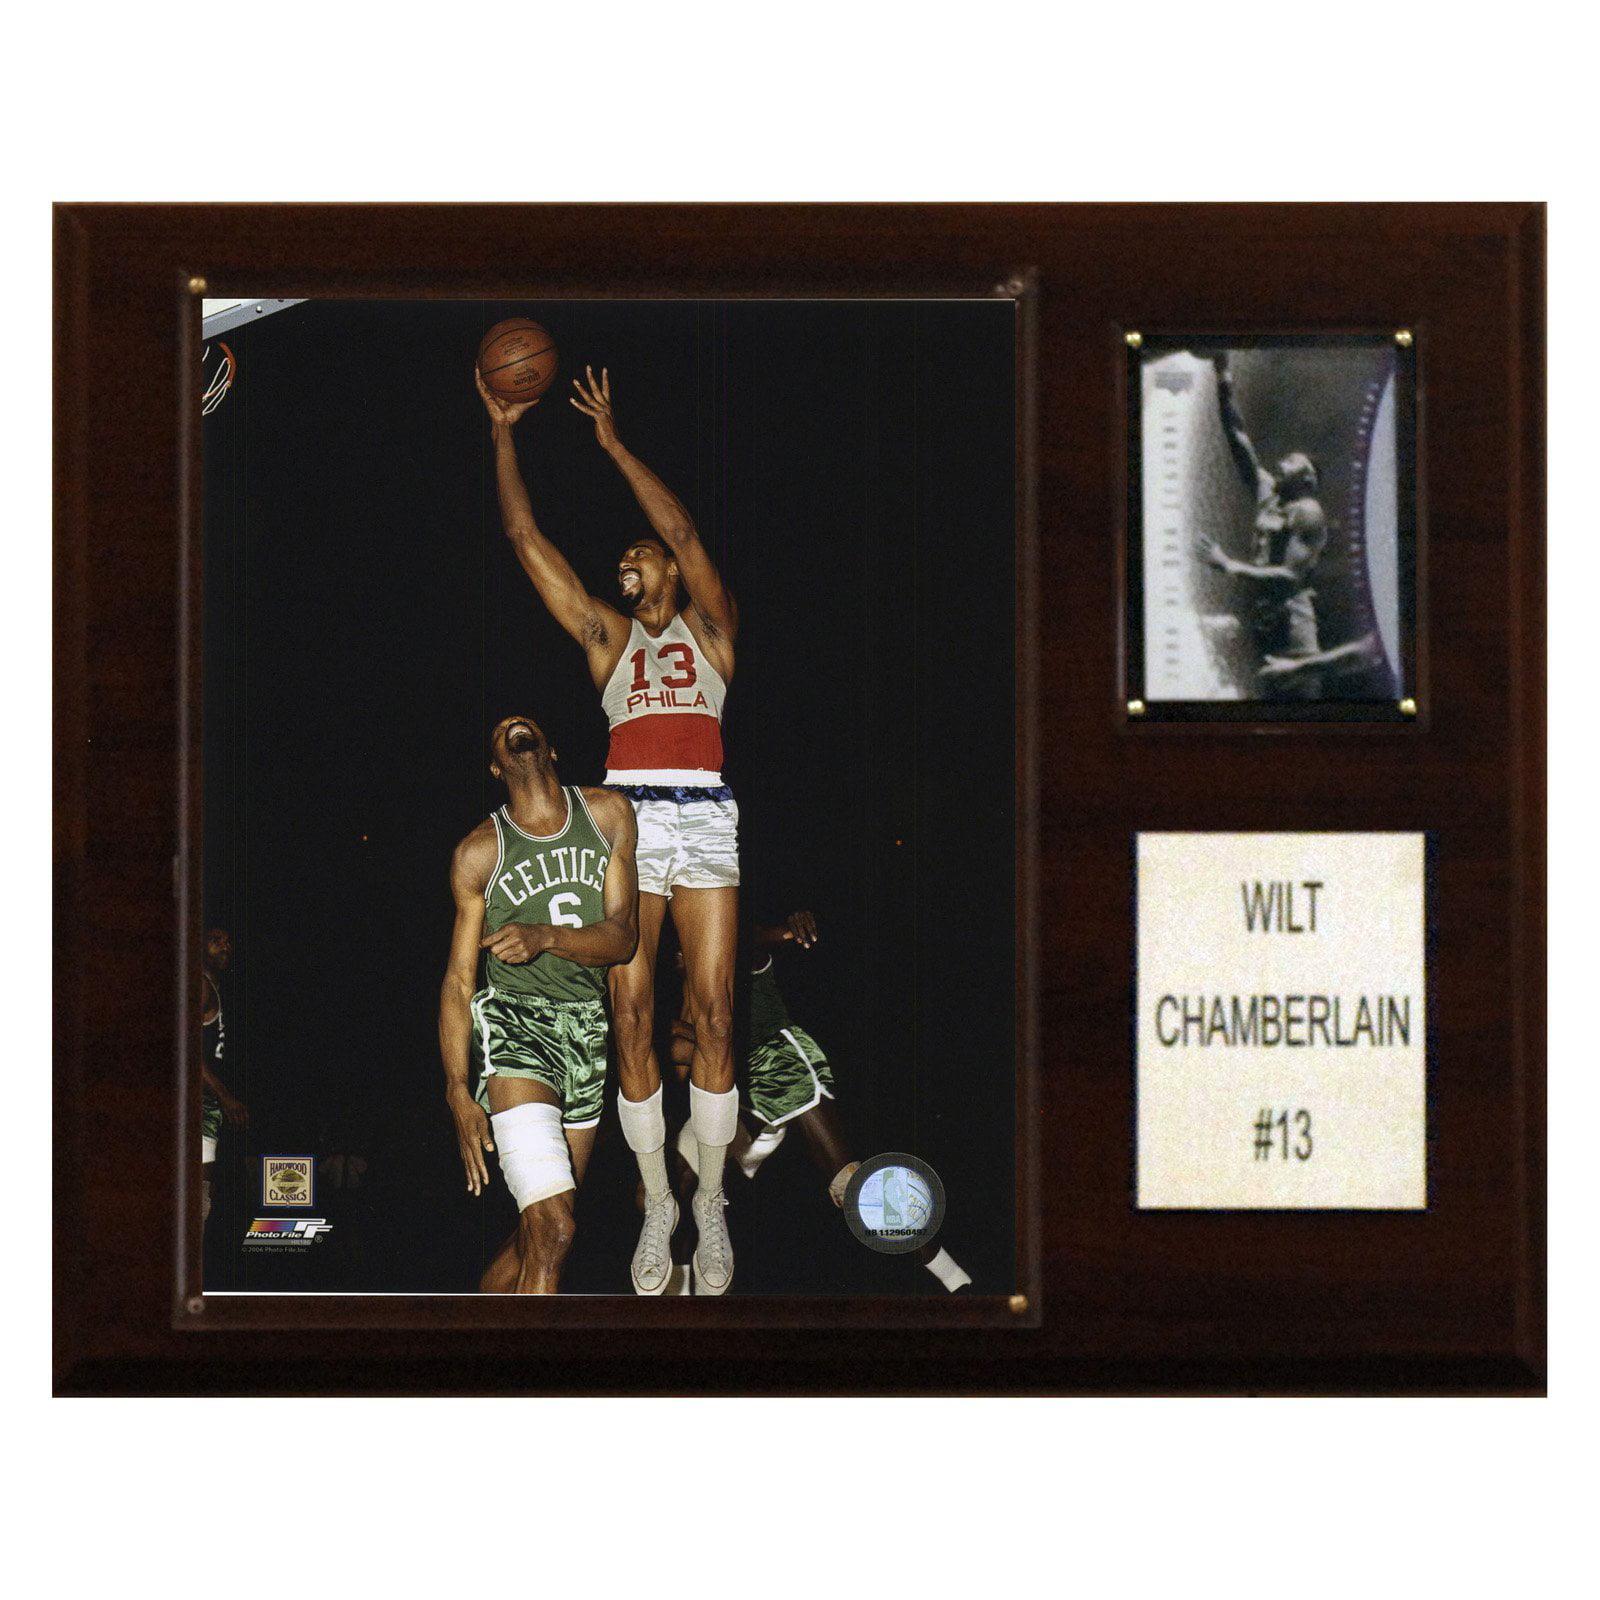 C&I Collectables NBA 12x15 Wilt Chamberlain Philadelphia 76ers Player Plaque